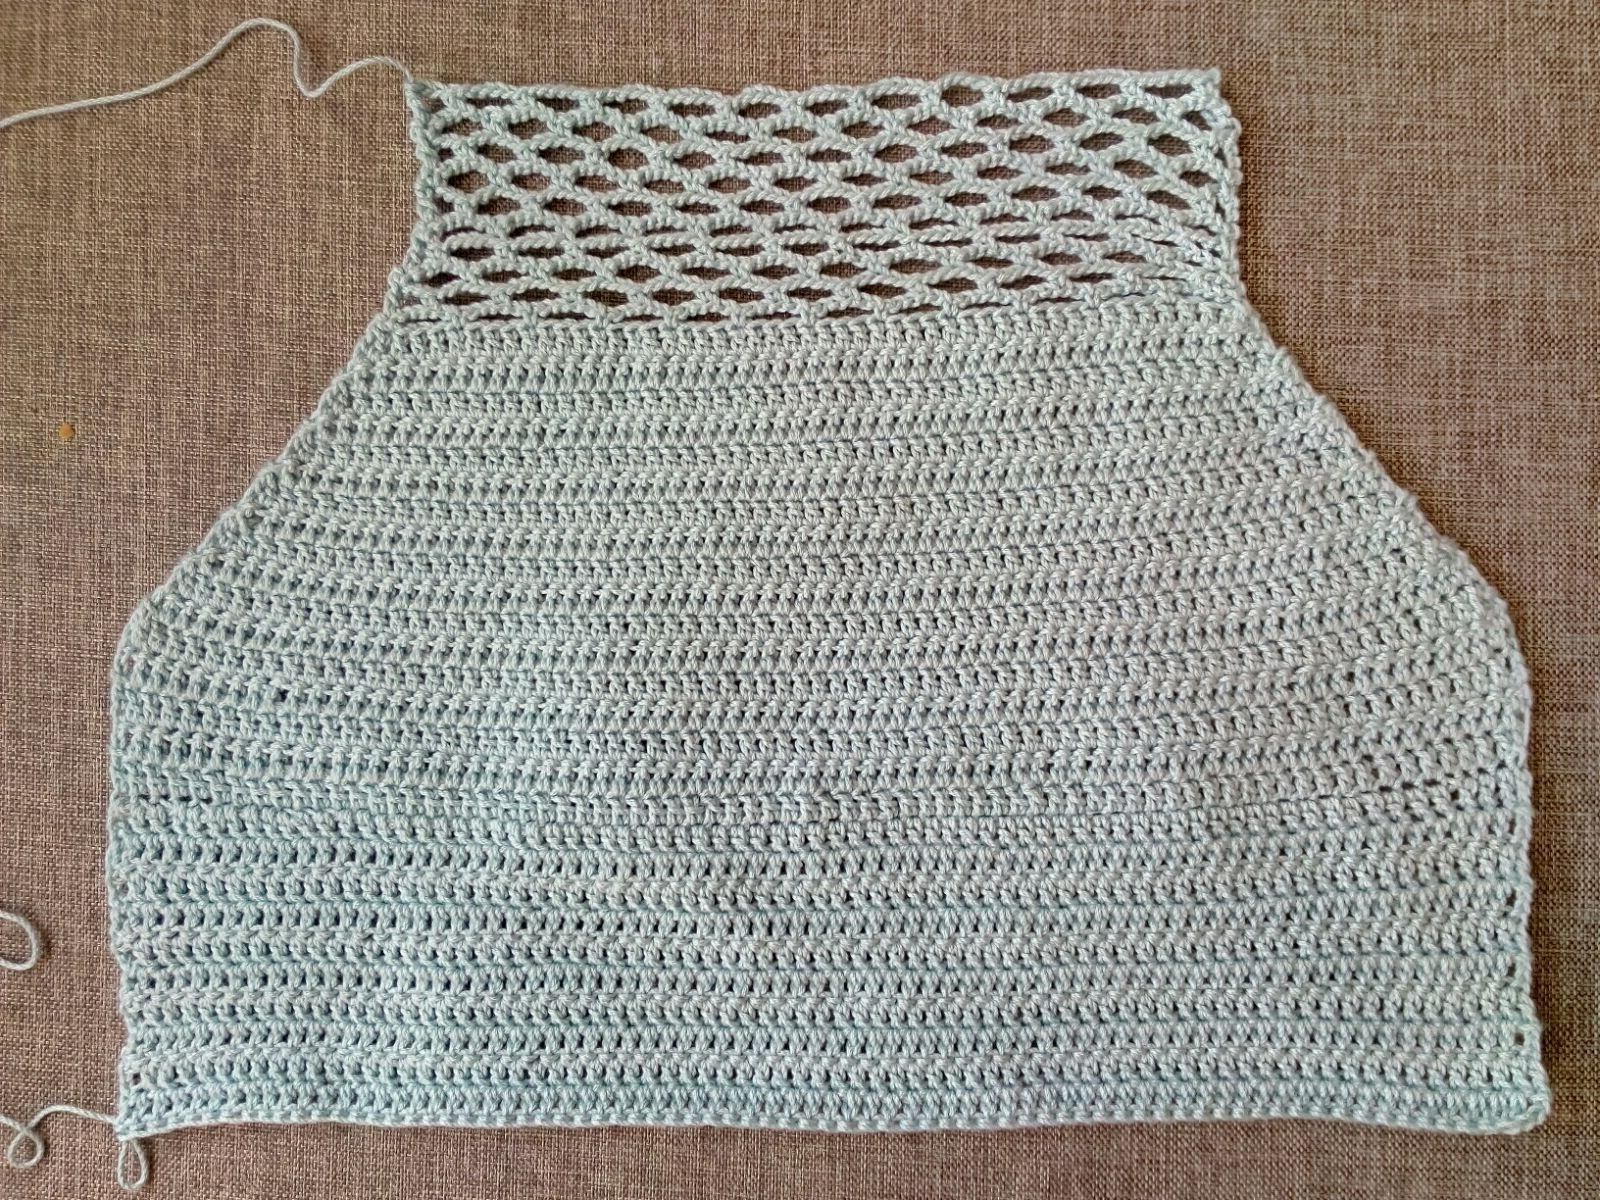 kuchichadas: Top medio largo crochet patrón